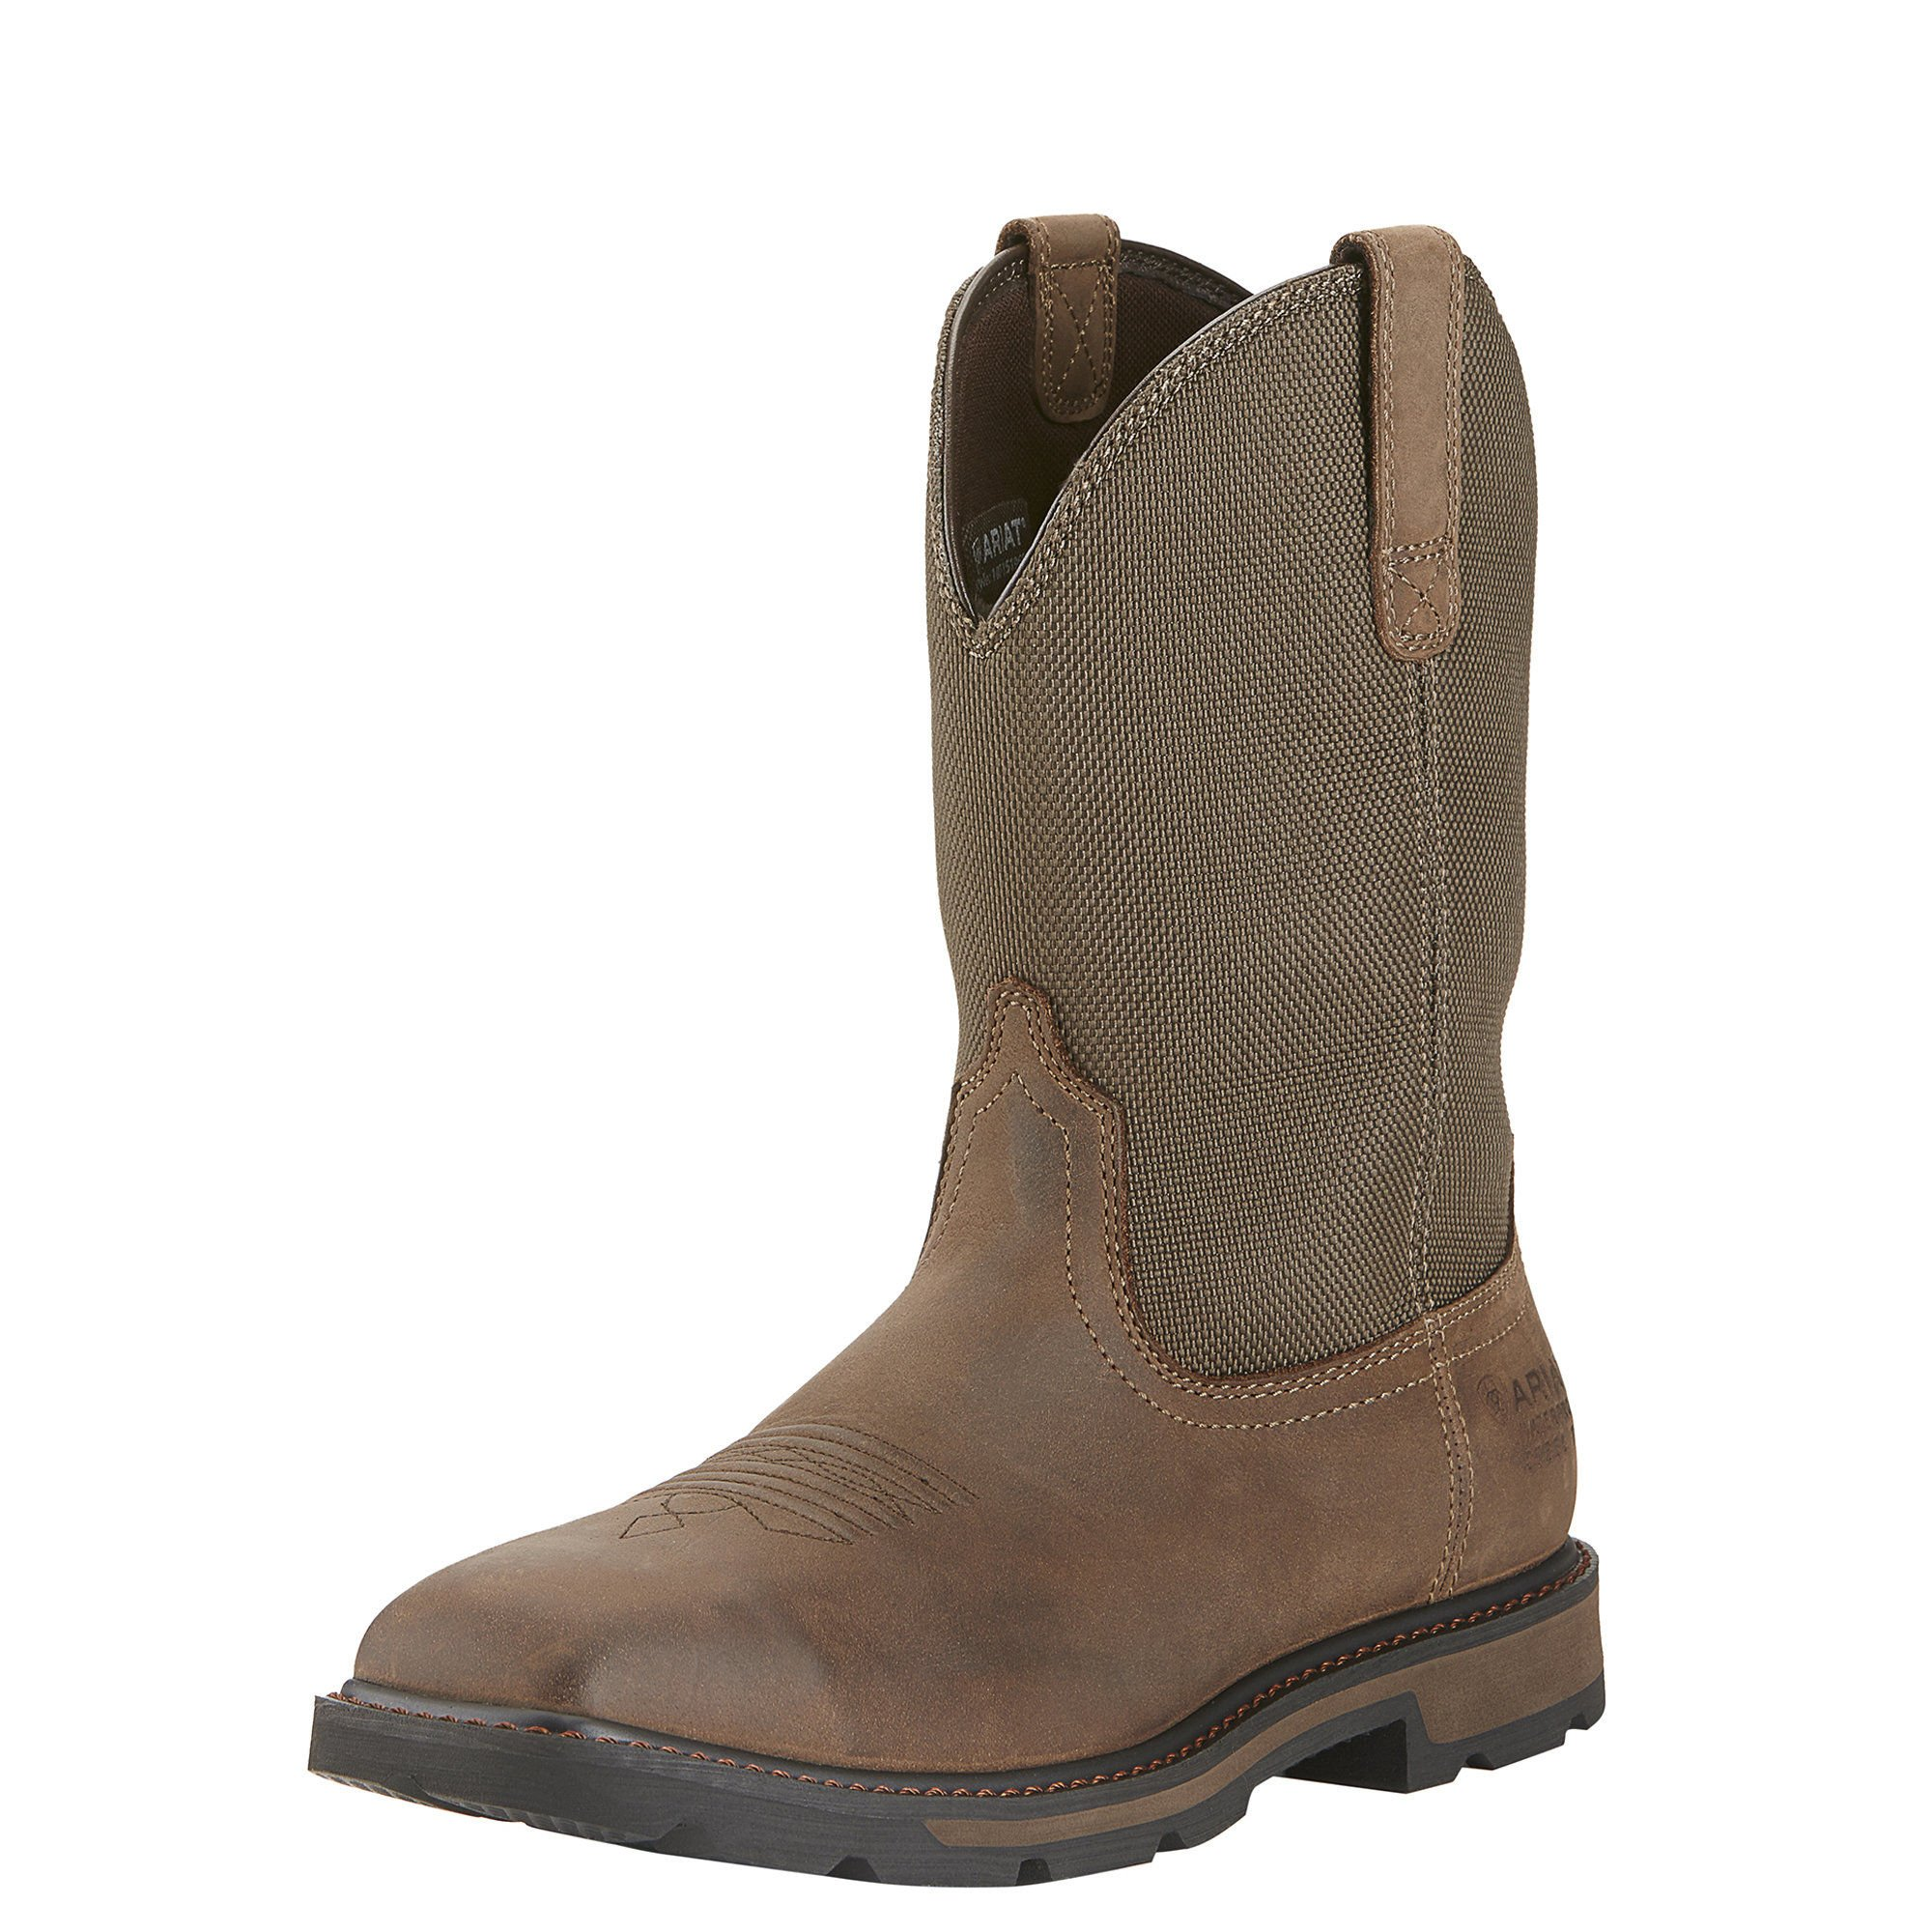 Ariat Men's Groundbreaker Wide Square H2O Steel Toe Work Boot, Palm Brown/Ballistic Brown, 12 M US